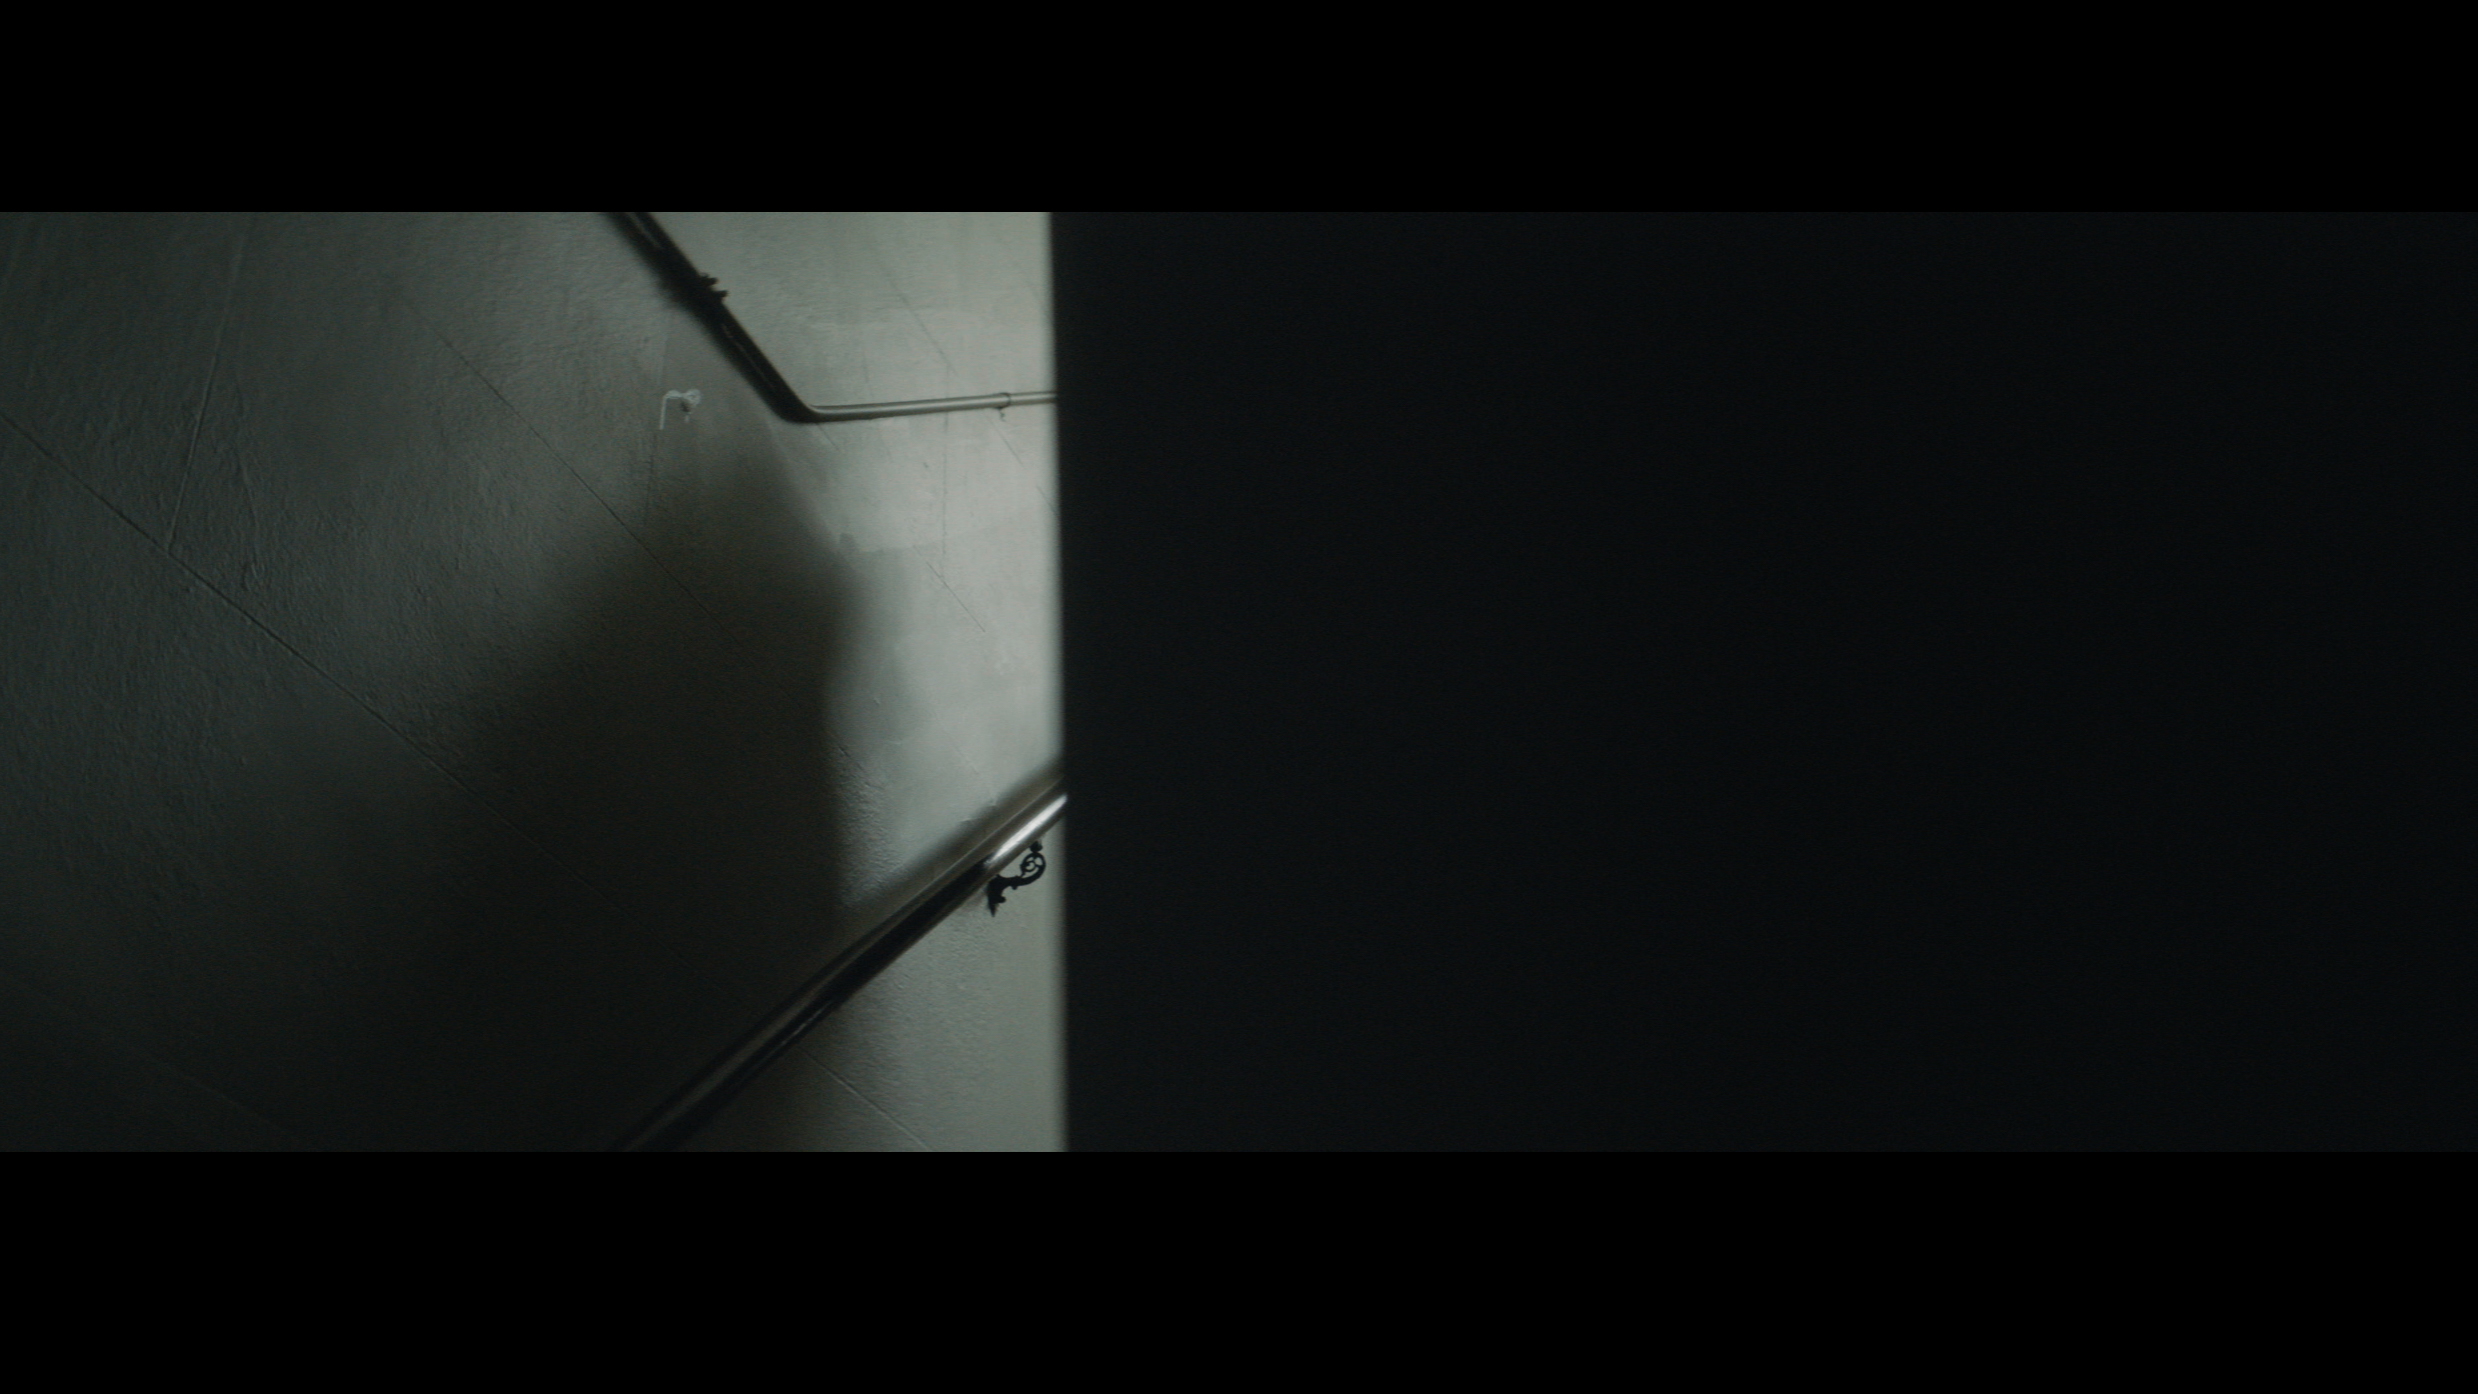 Screen Shot 2018-04-11 at 12.36.10 PM.jpg